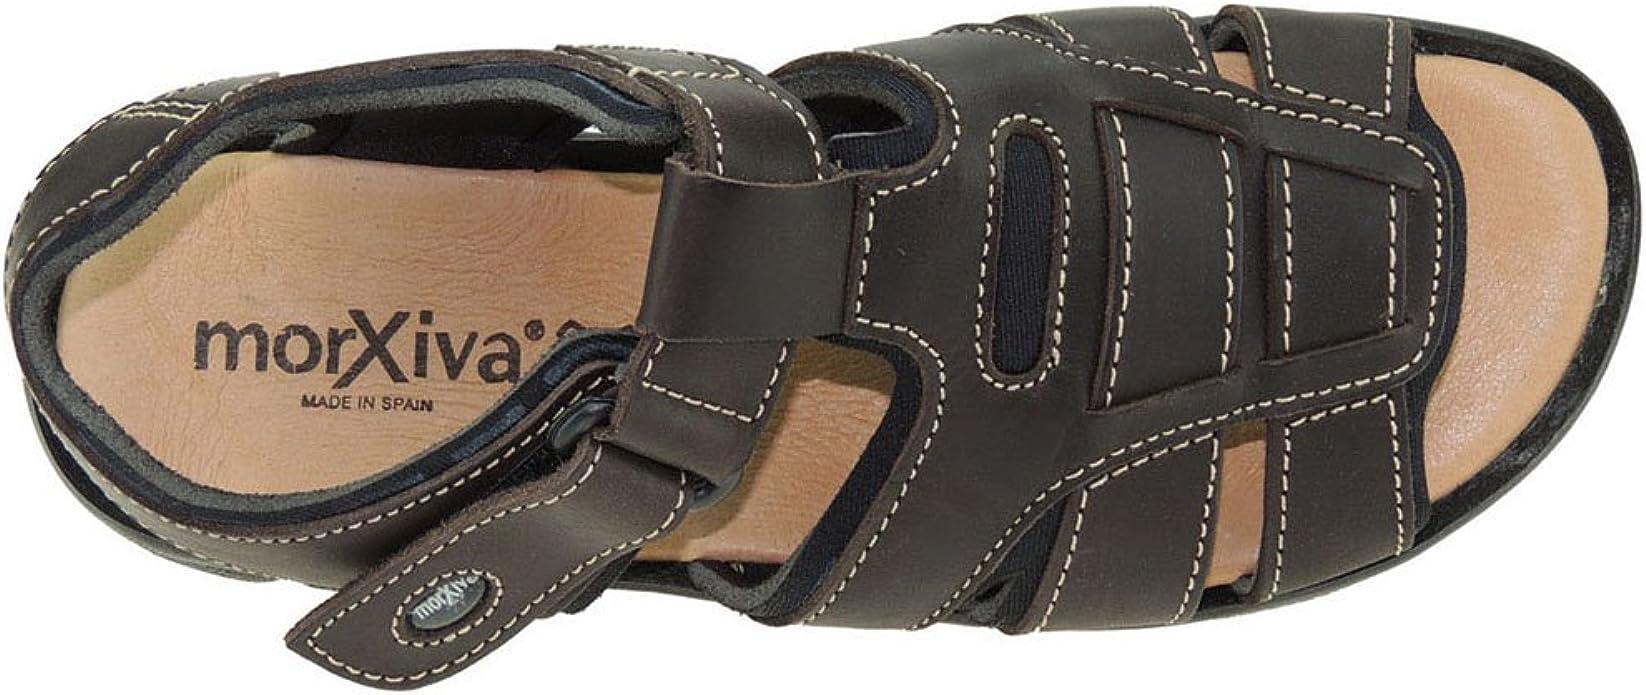 MORXIVA 7001 Sandalia Arizona California Velcros Forro Neopreno Punta Abierta para Hombre